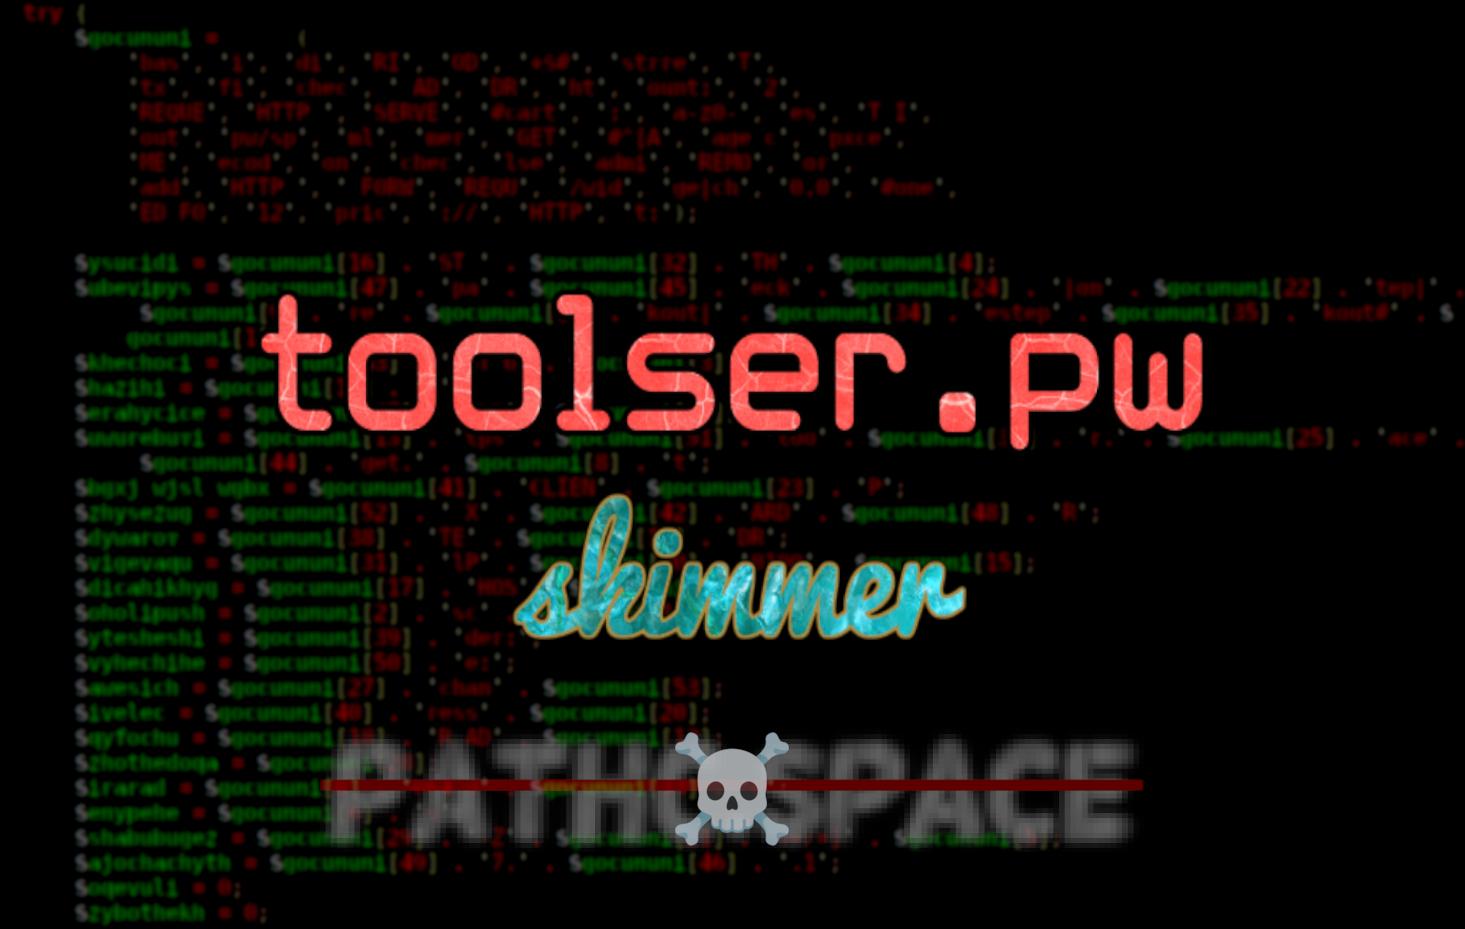 MAGECART GROUP 12: toolser.pw skimmer